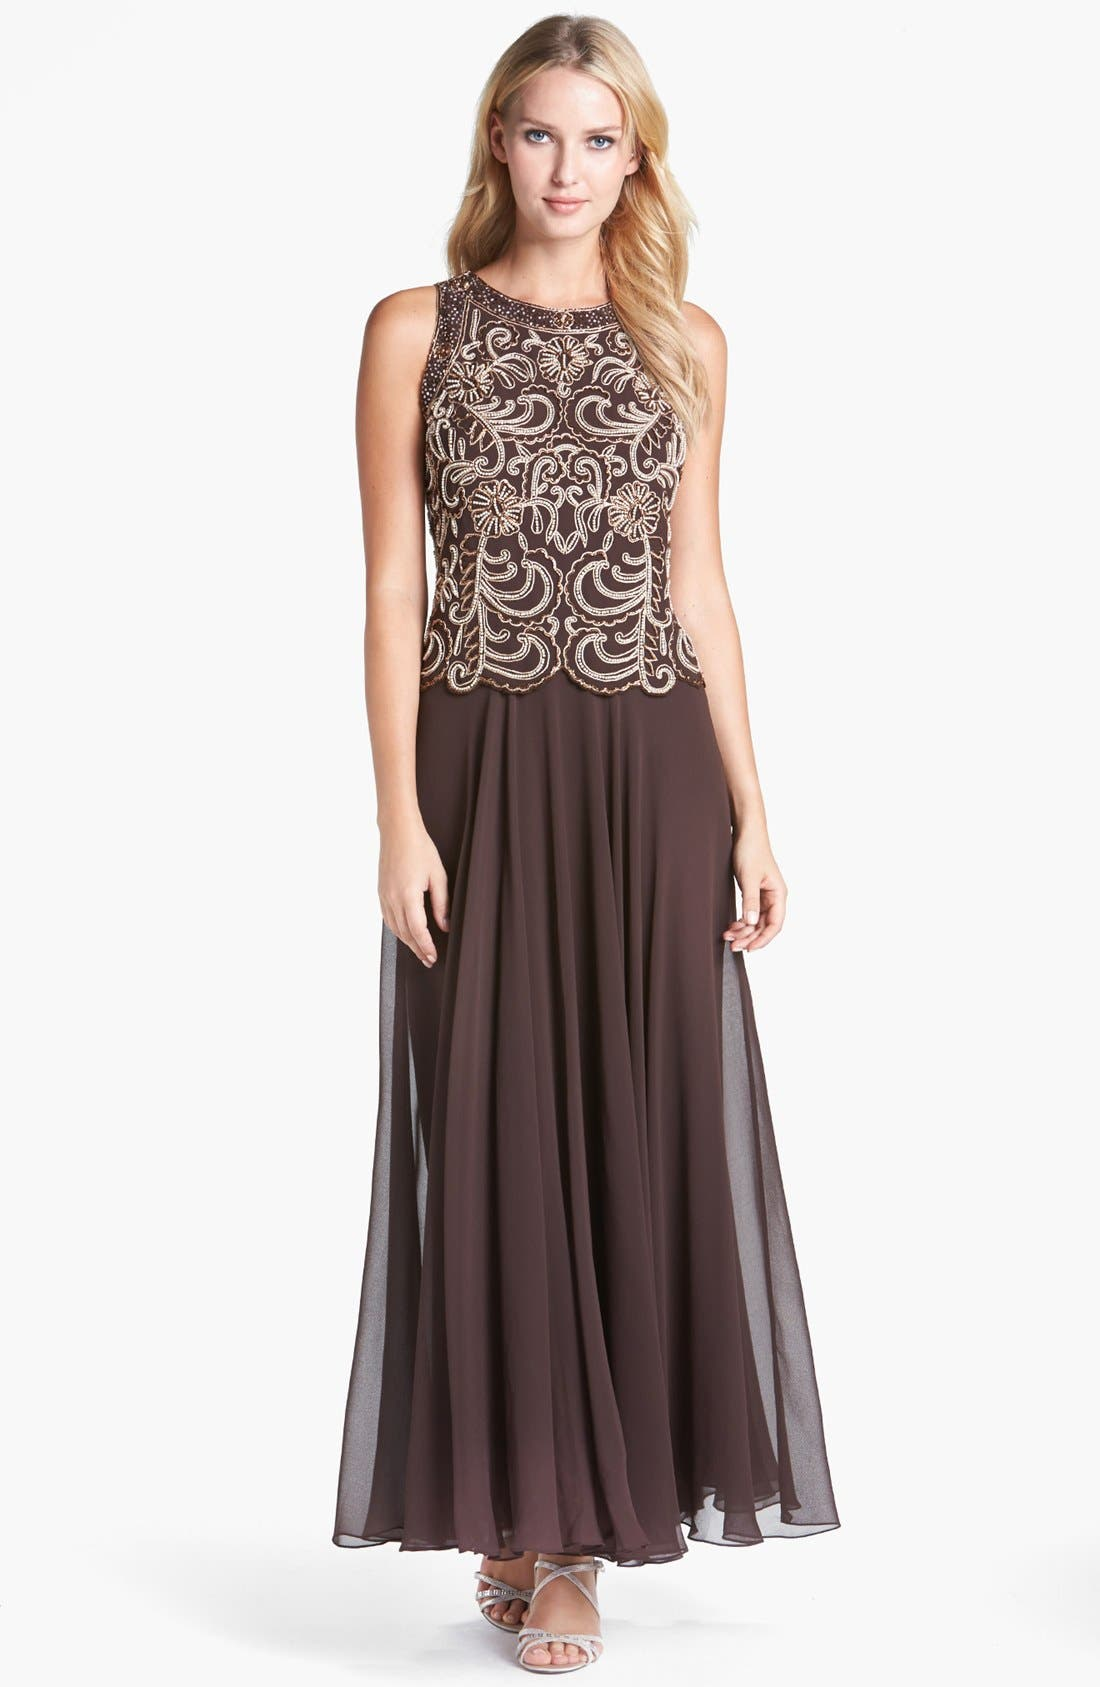 Alternate Image 1 Selected - J Kara Beaded Mock Two-Piece Dress